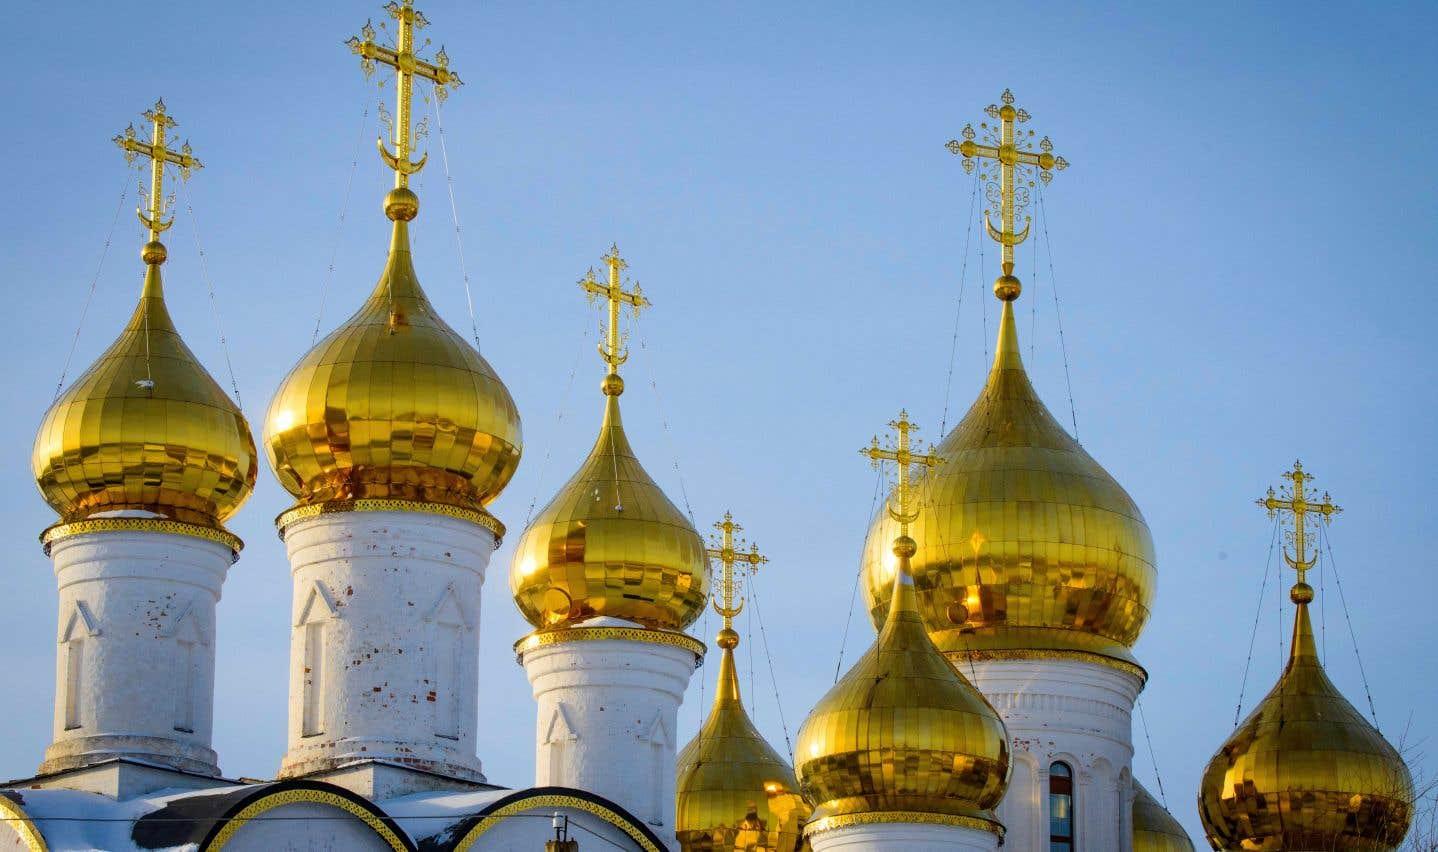 Une église orthodoxe à Pereslavl-Zalessky, en Russie